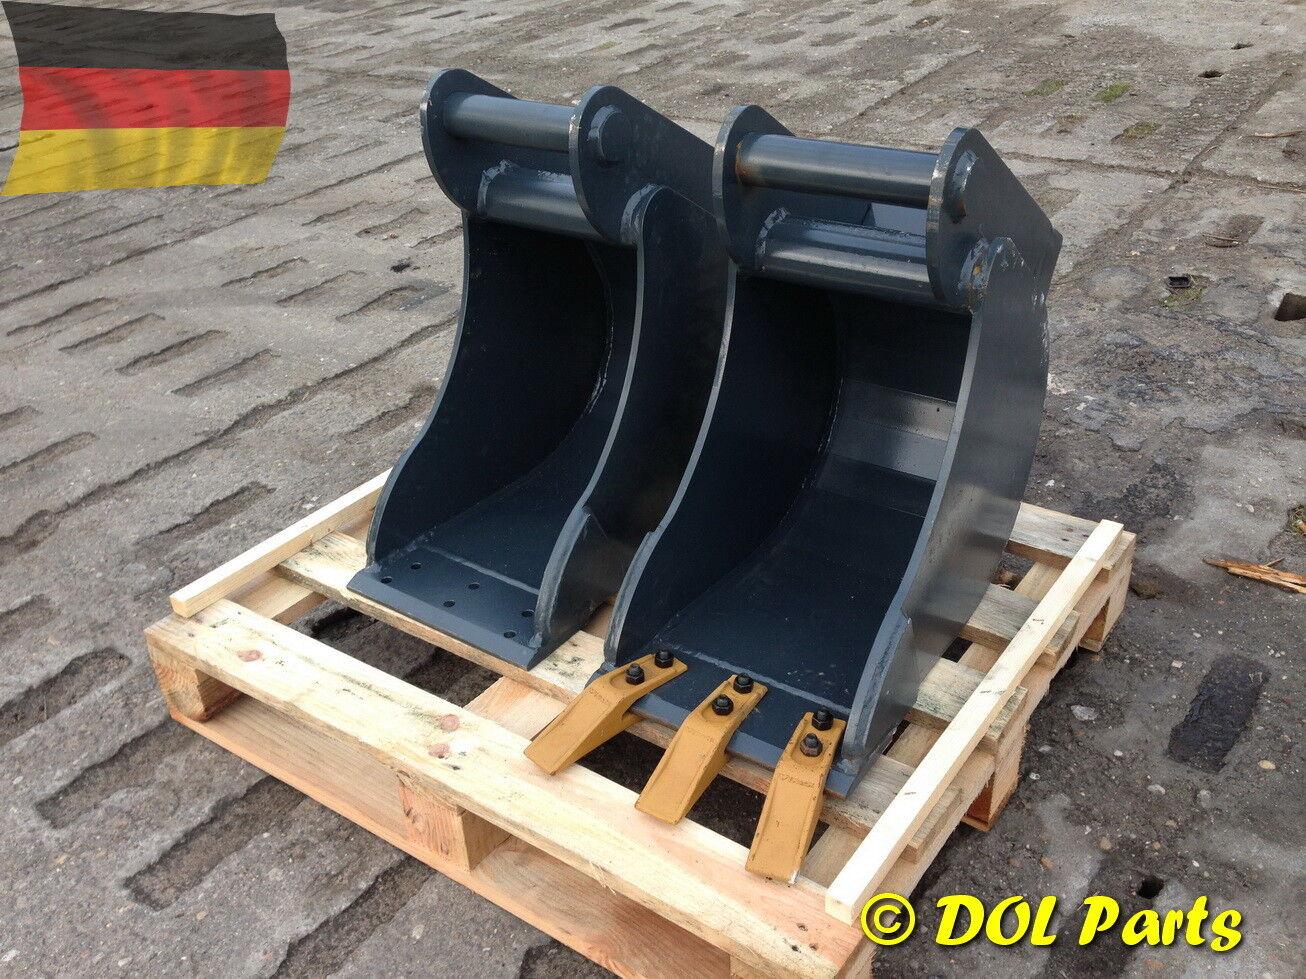 Tieflöffel Ms03 800 Mm Baggerlöffel Schaufel Minibagger Ms 03 800 Cm 4-6 T Baumaschinenteile & Zubehör Anbaugeräte